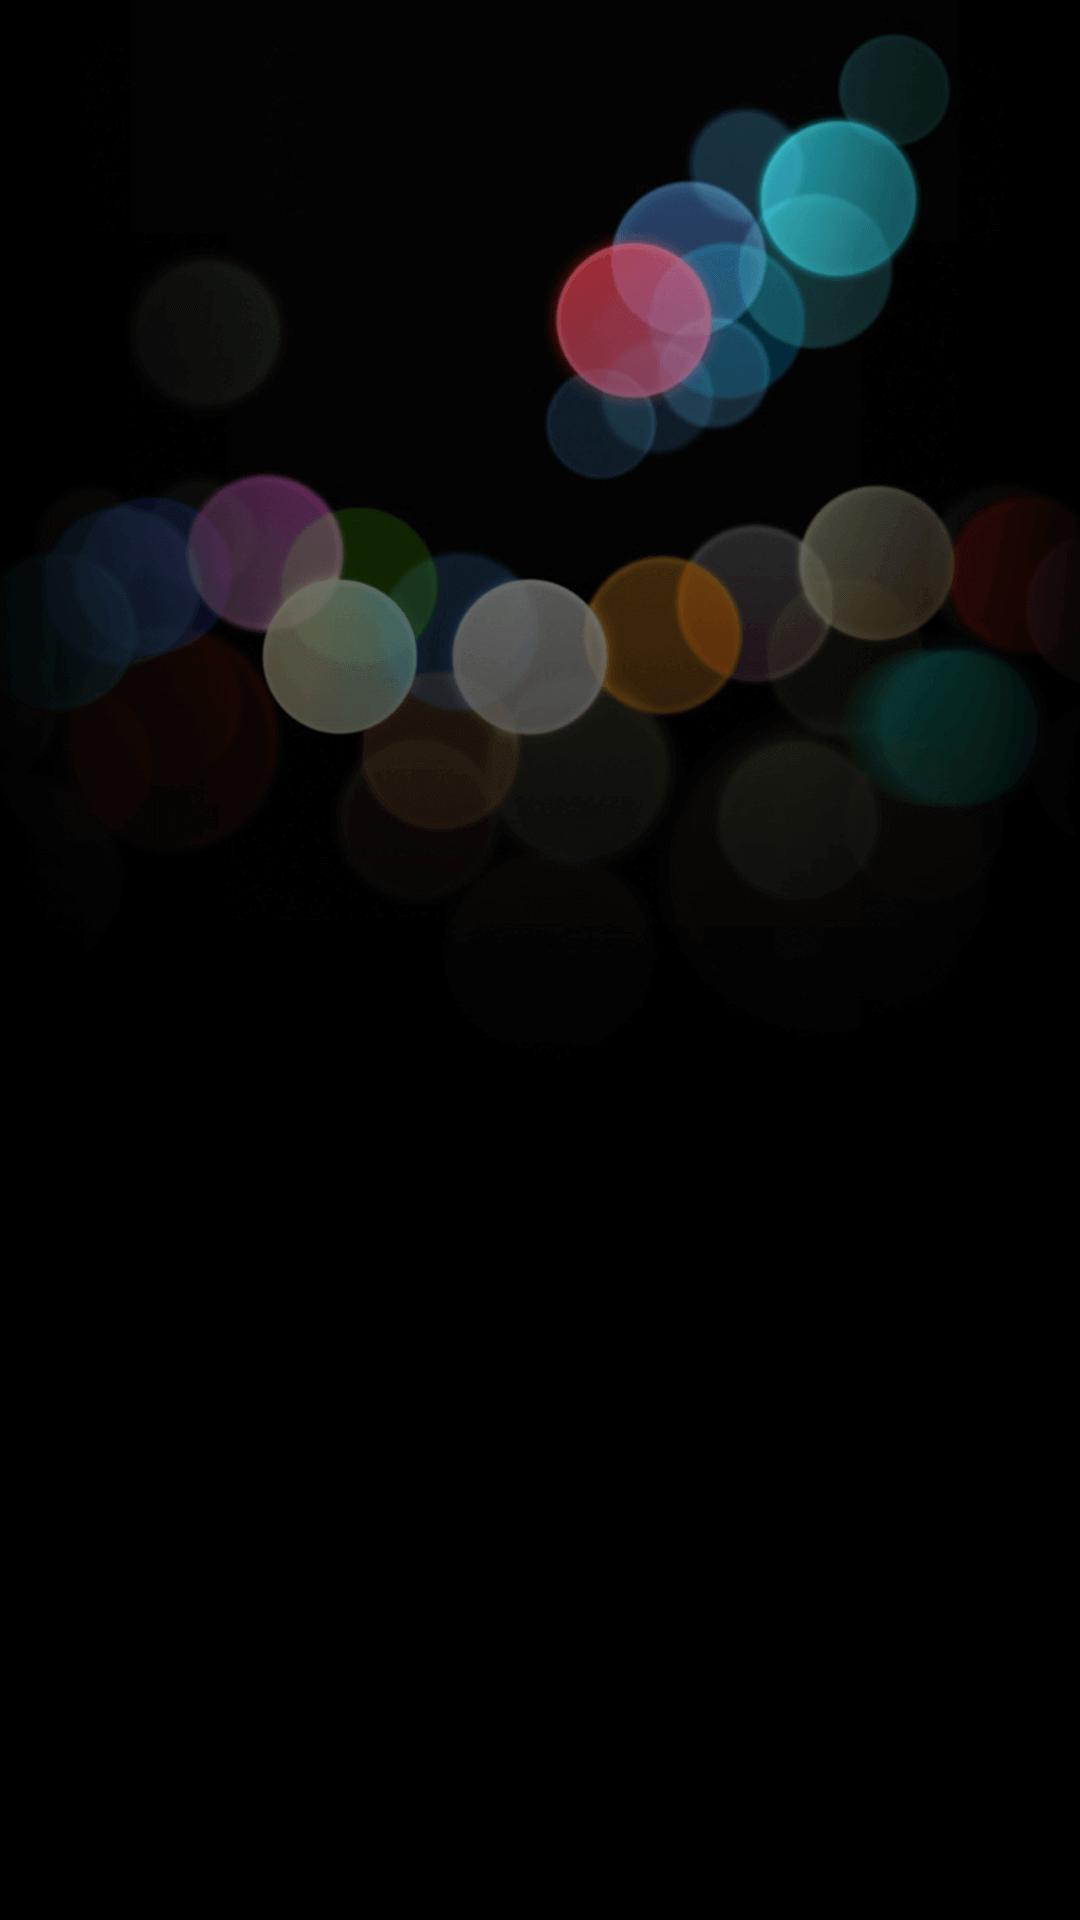 003iphone